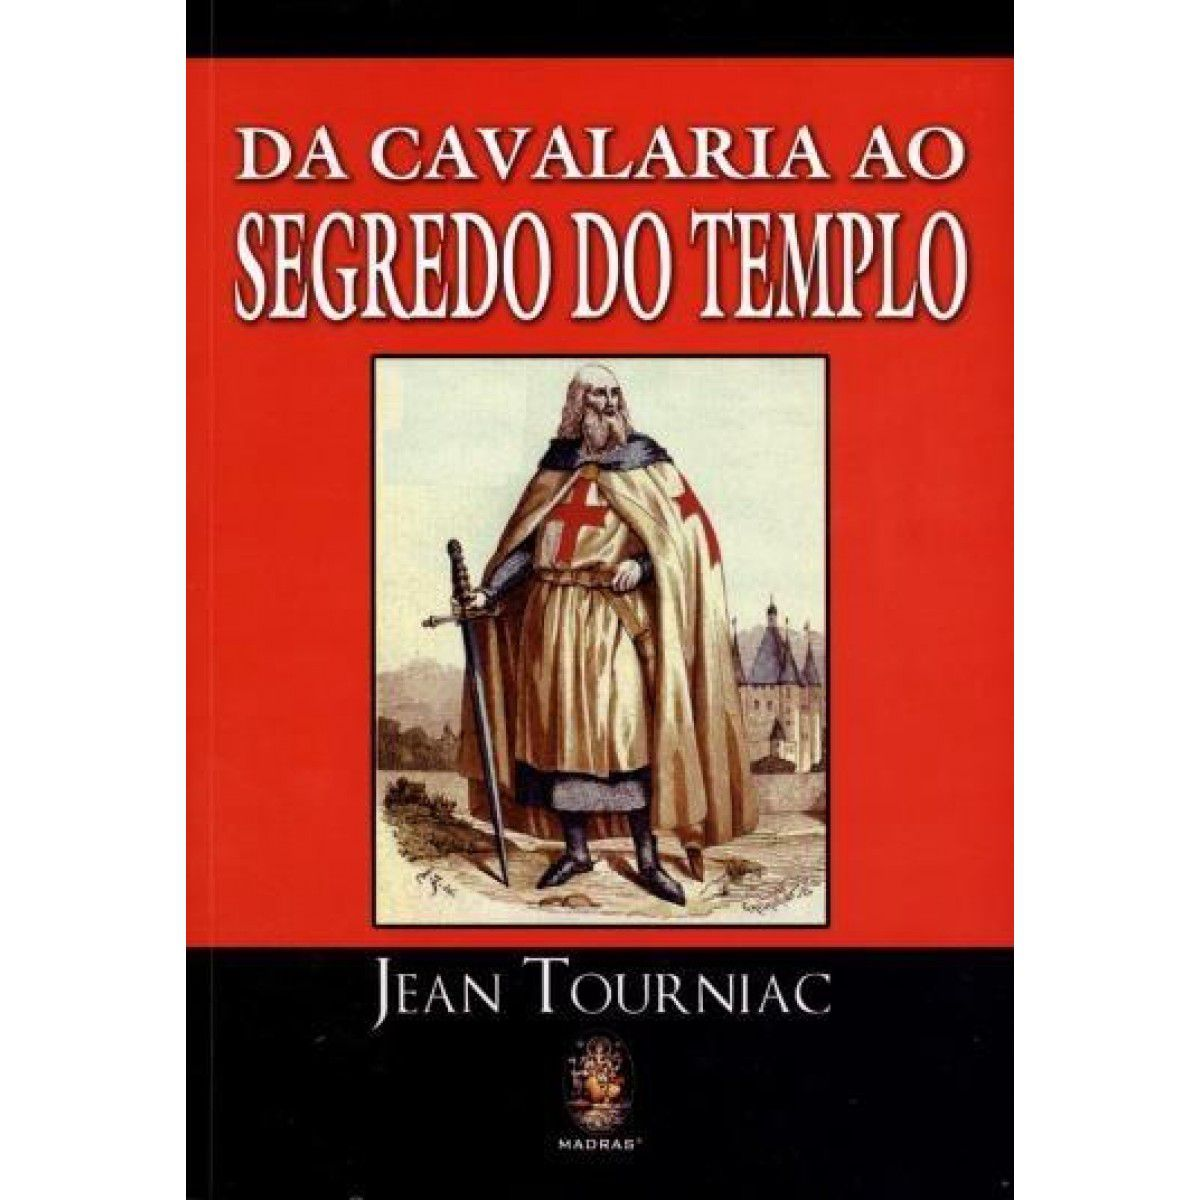 LIVRO DA CAVALARIA AO SEGREDO DO TEMPLO